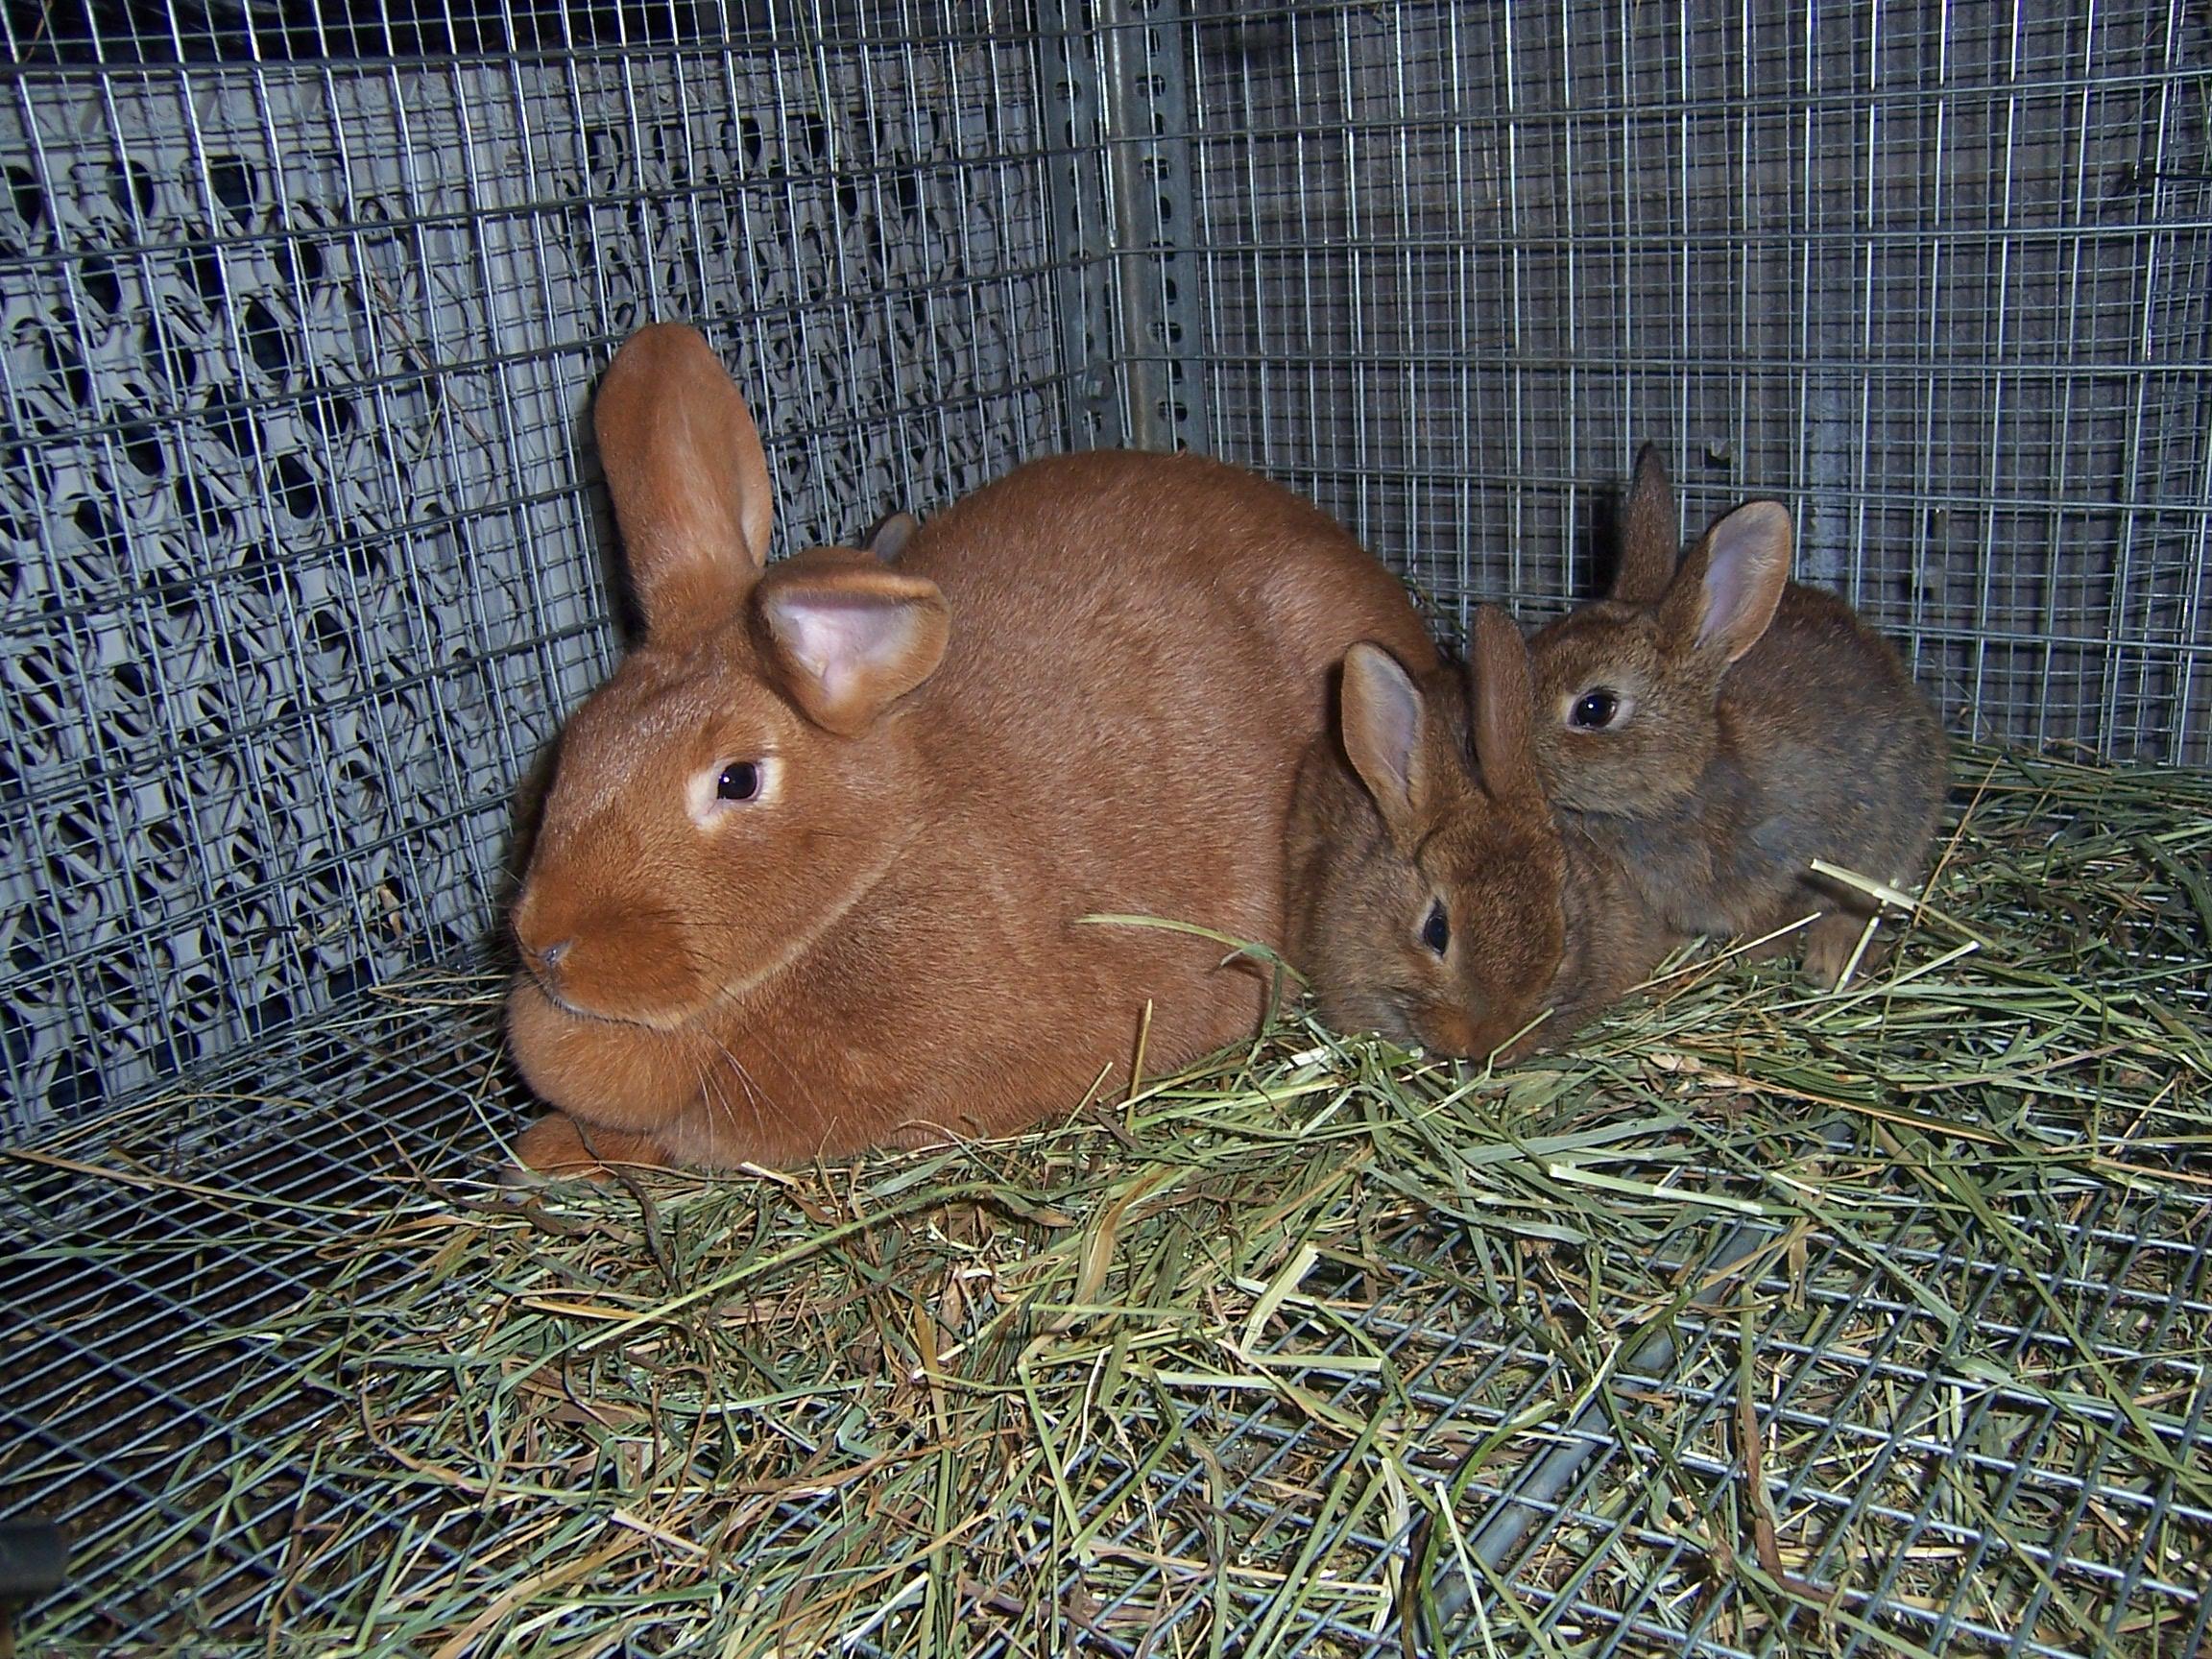 palomino rabbits - photo #23